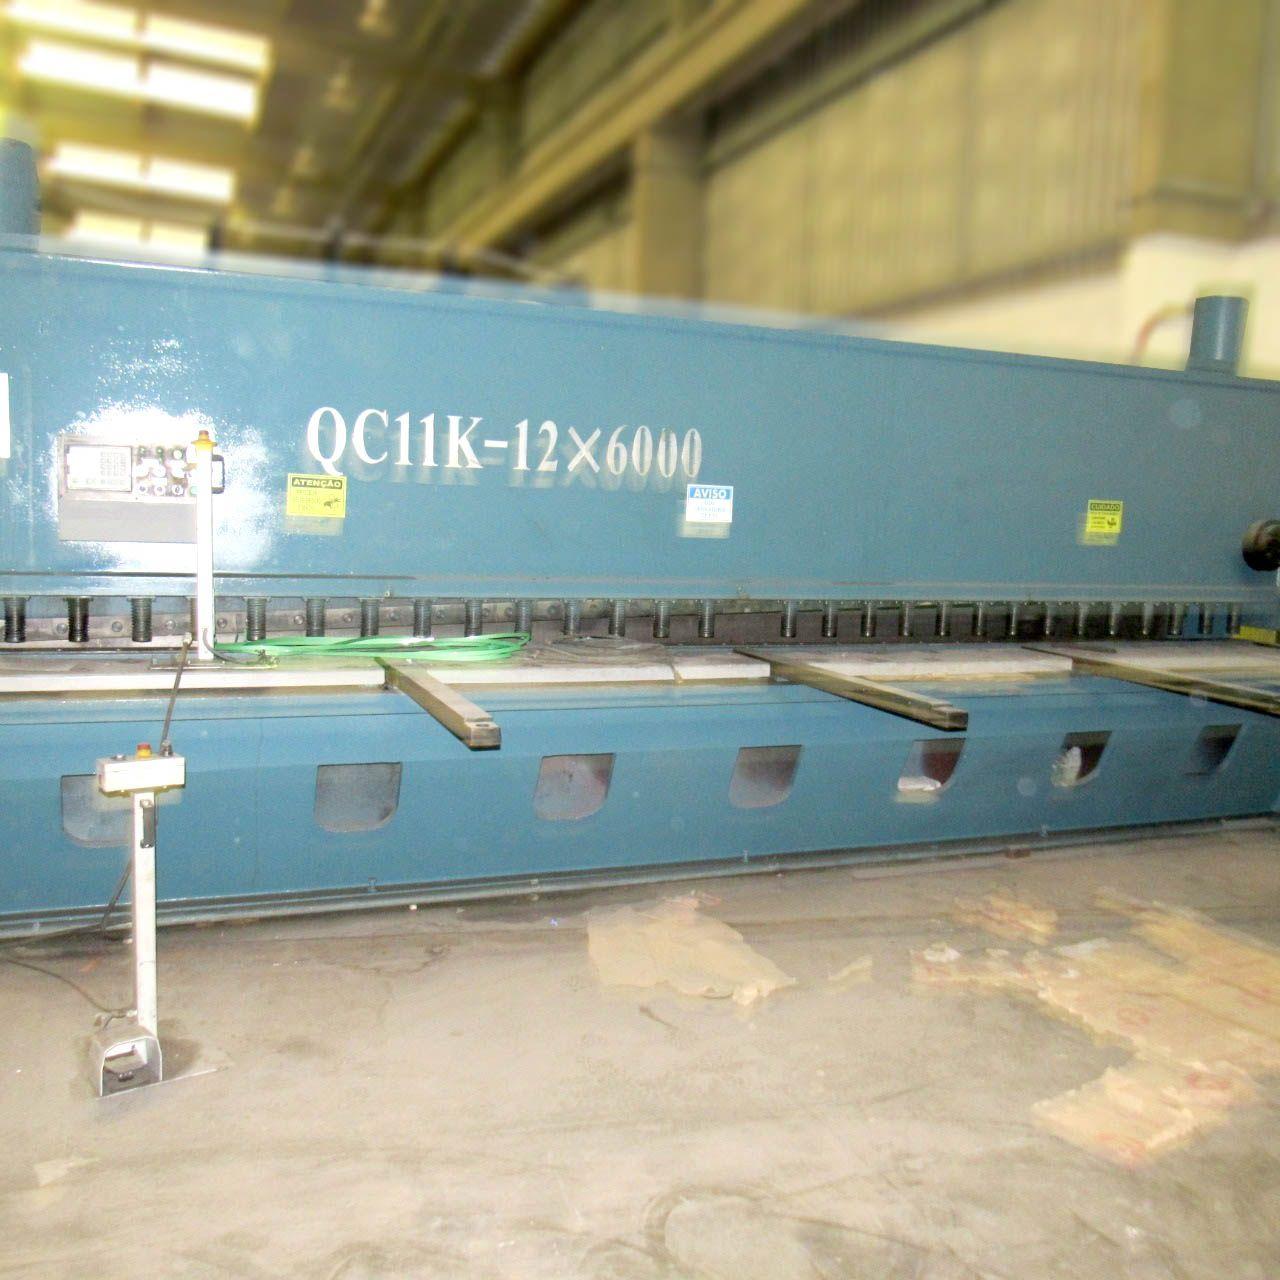 Guilhotina Hidráulica 6000mm X ½'' QC11K Cd516